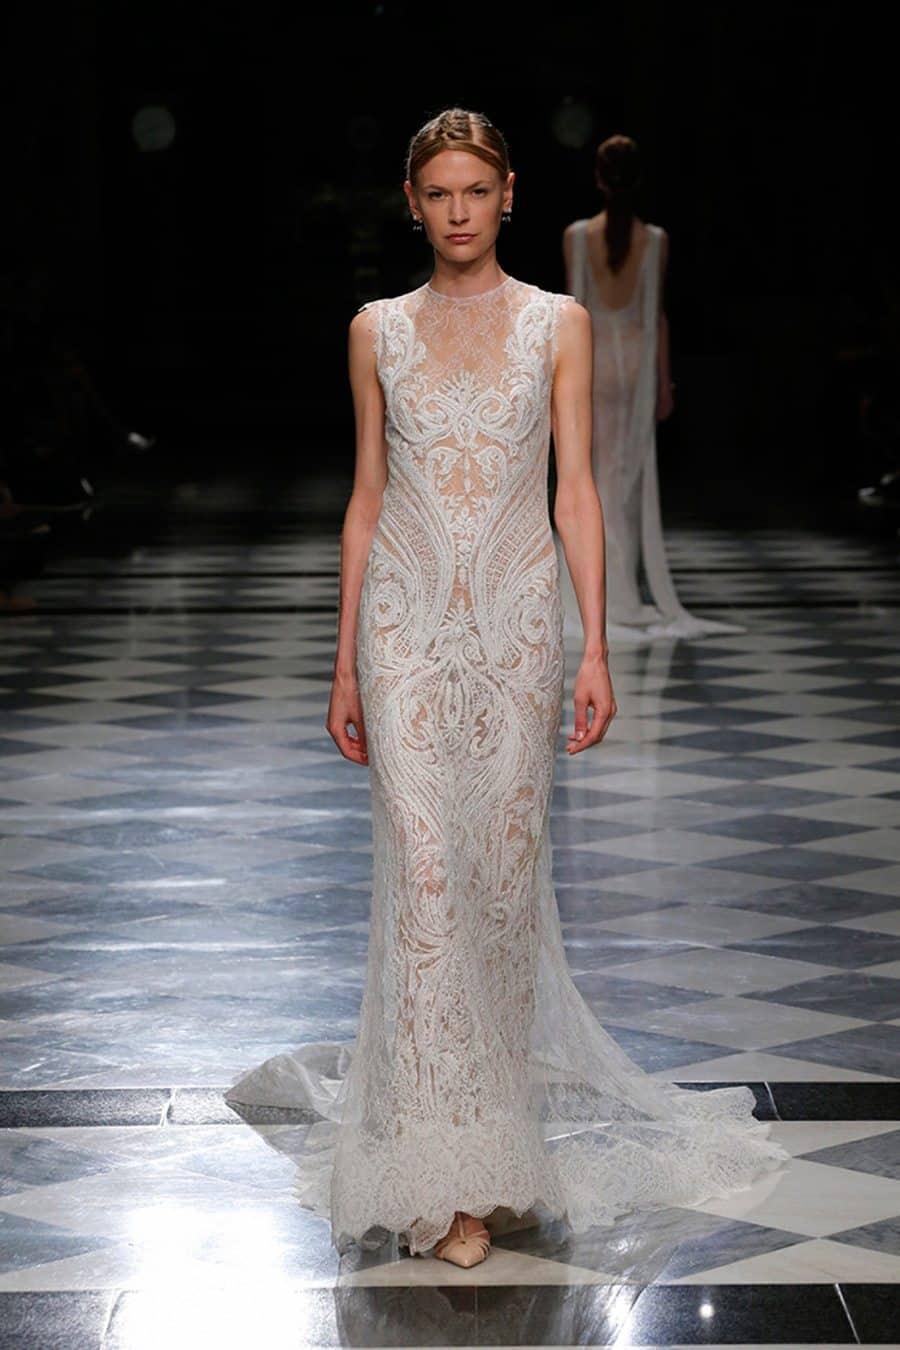 bride-high-fashion-couture-weddingdress-wedding-bridedress-couturedress-highfashion-yolancris-70